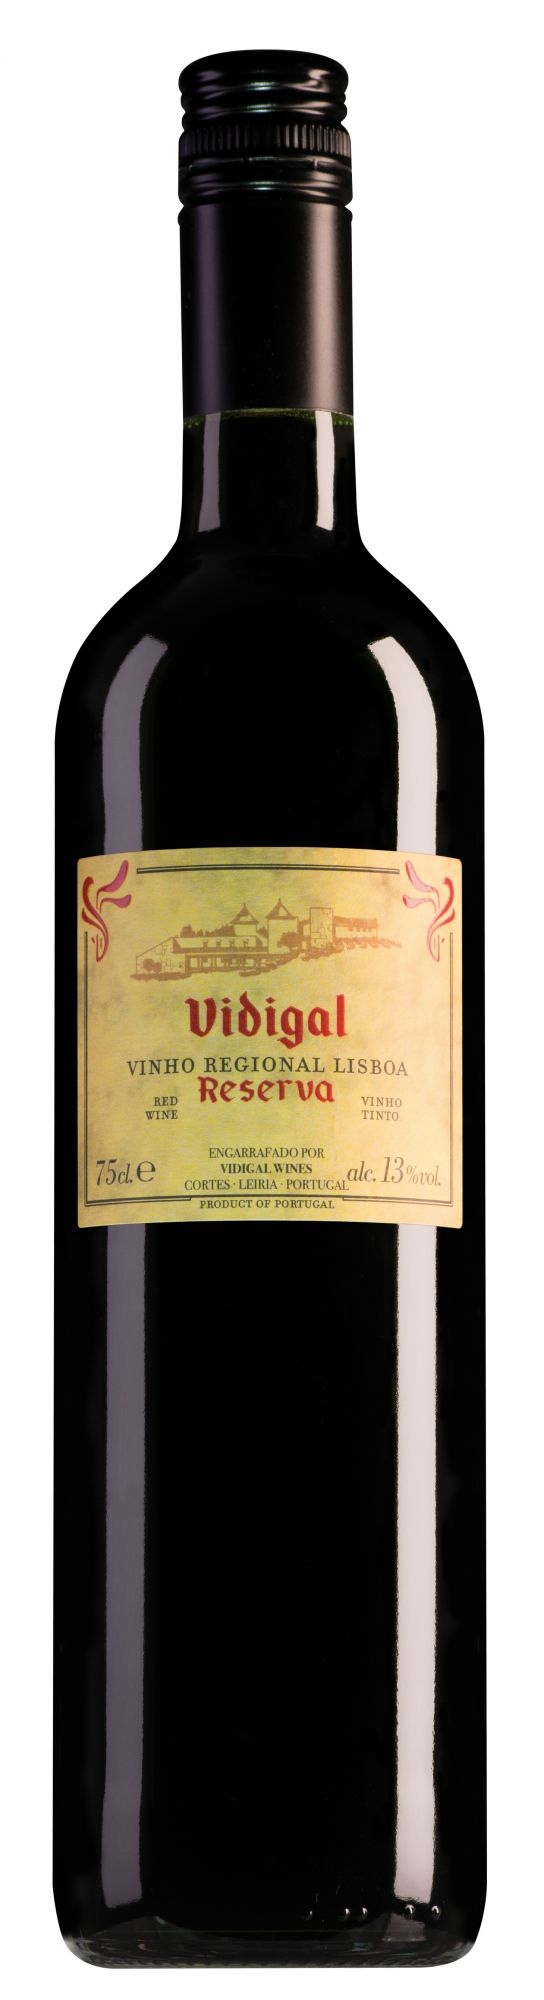 Vidigal Lisboa Reserva